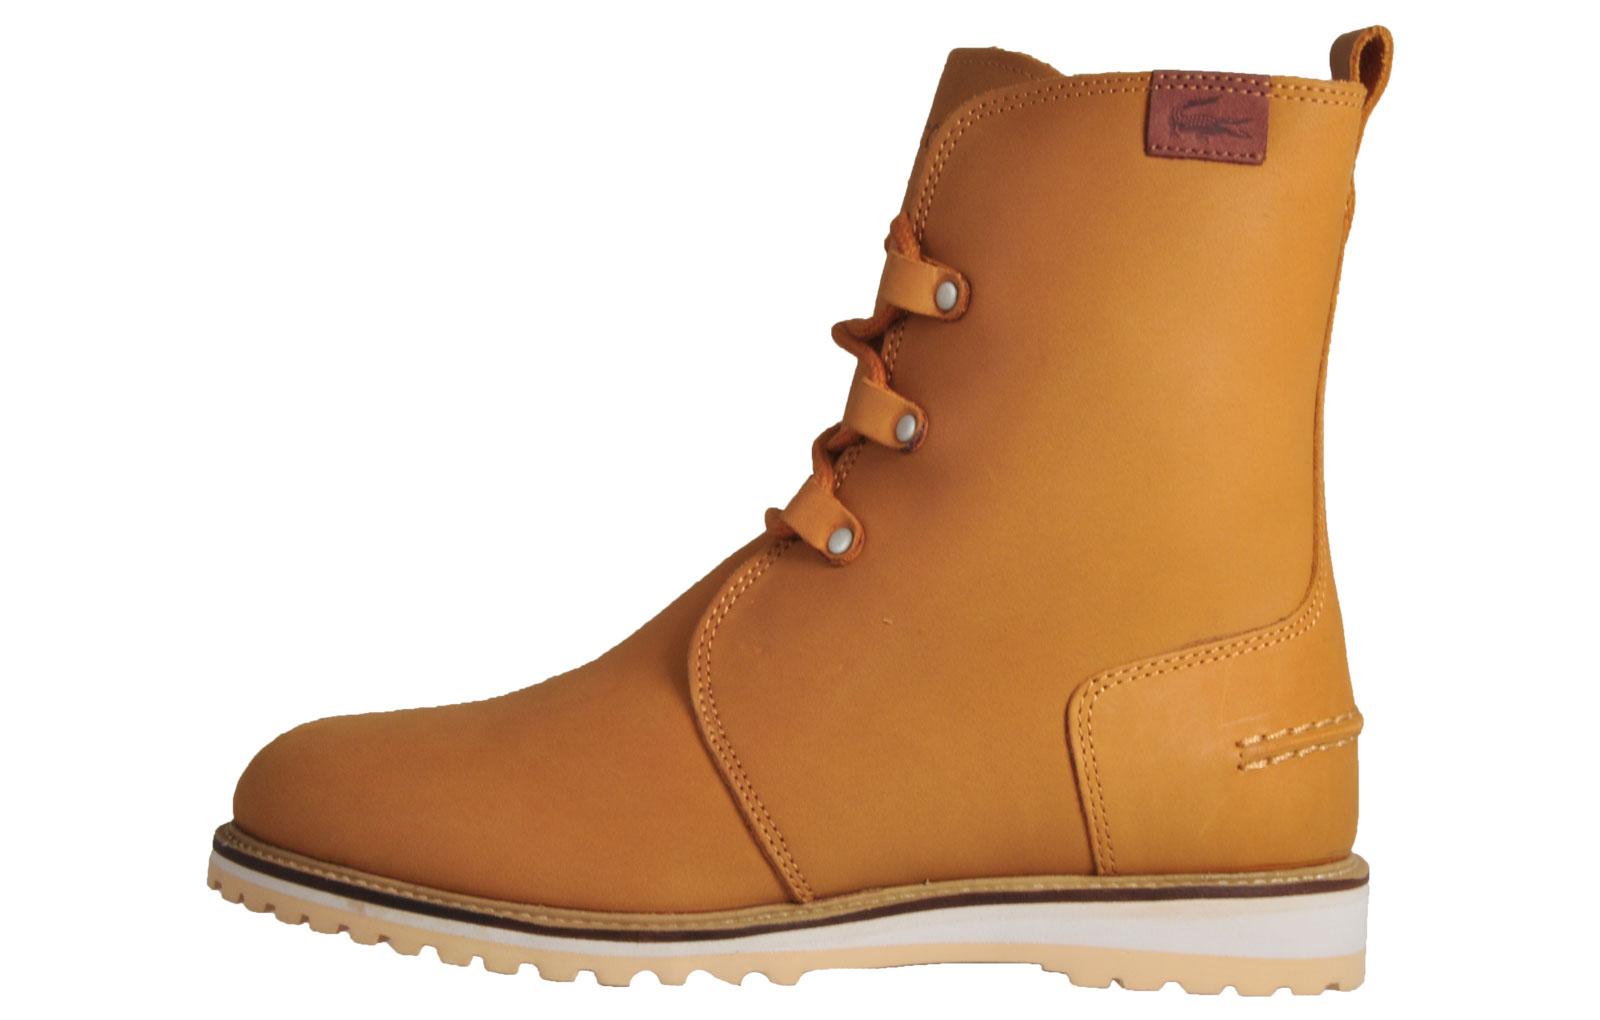 Lacoste Baylen 4 Women's Premium Leather Boots Light Tan B Grade UK 4 Only